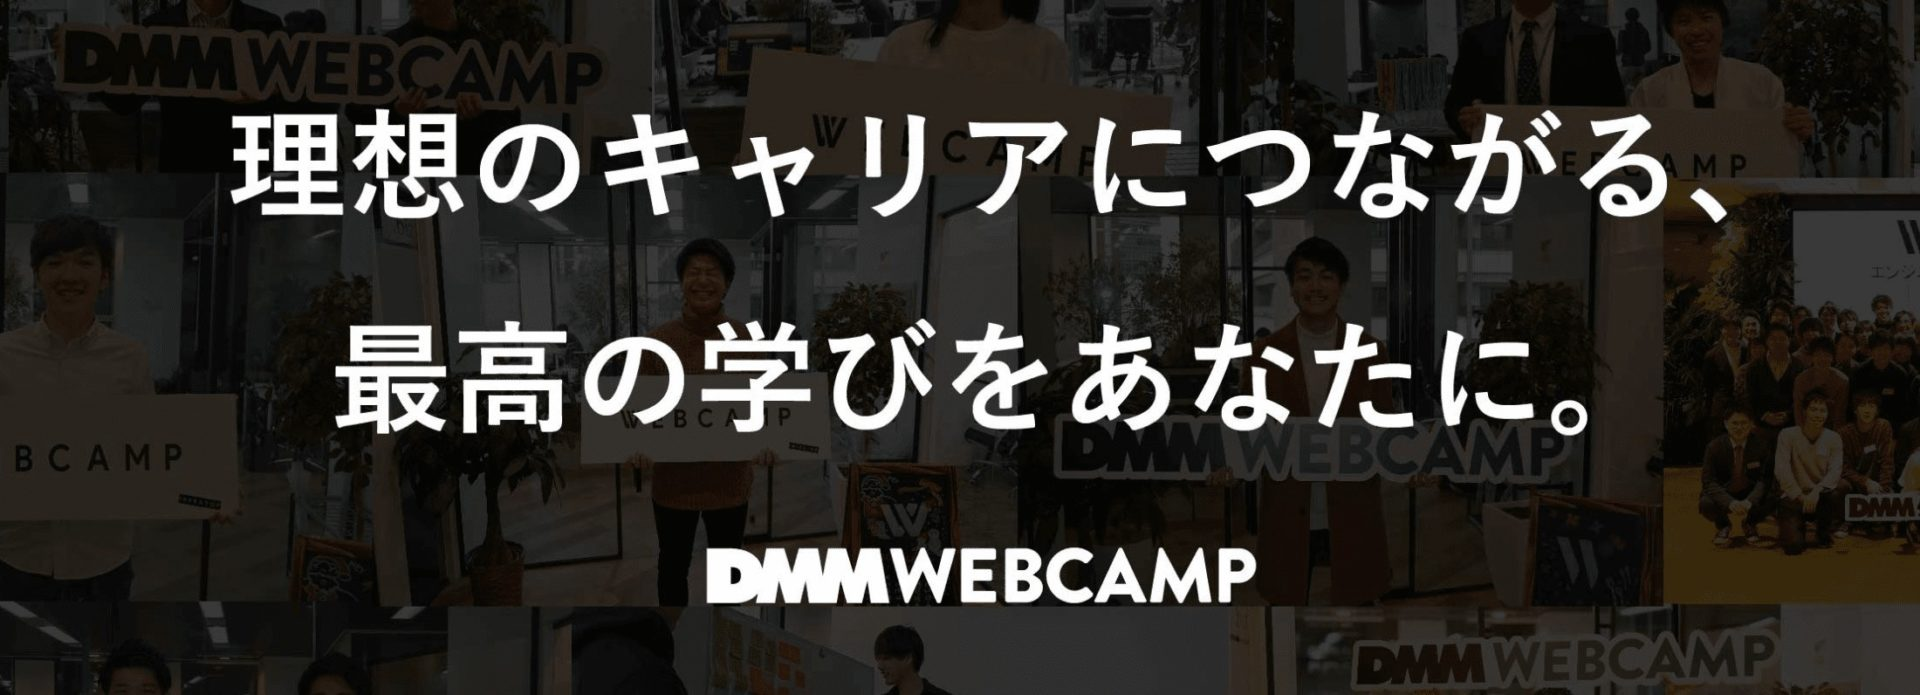 DMM WEBCAMP(ウェブキャンプ)の評判を総評してみると?の見出し画像